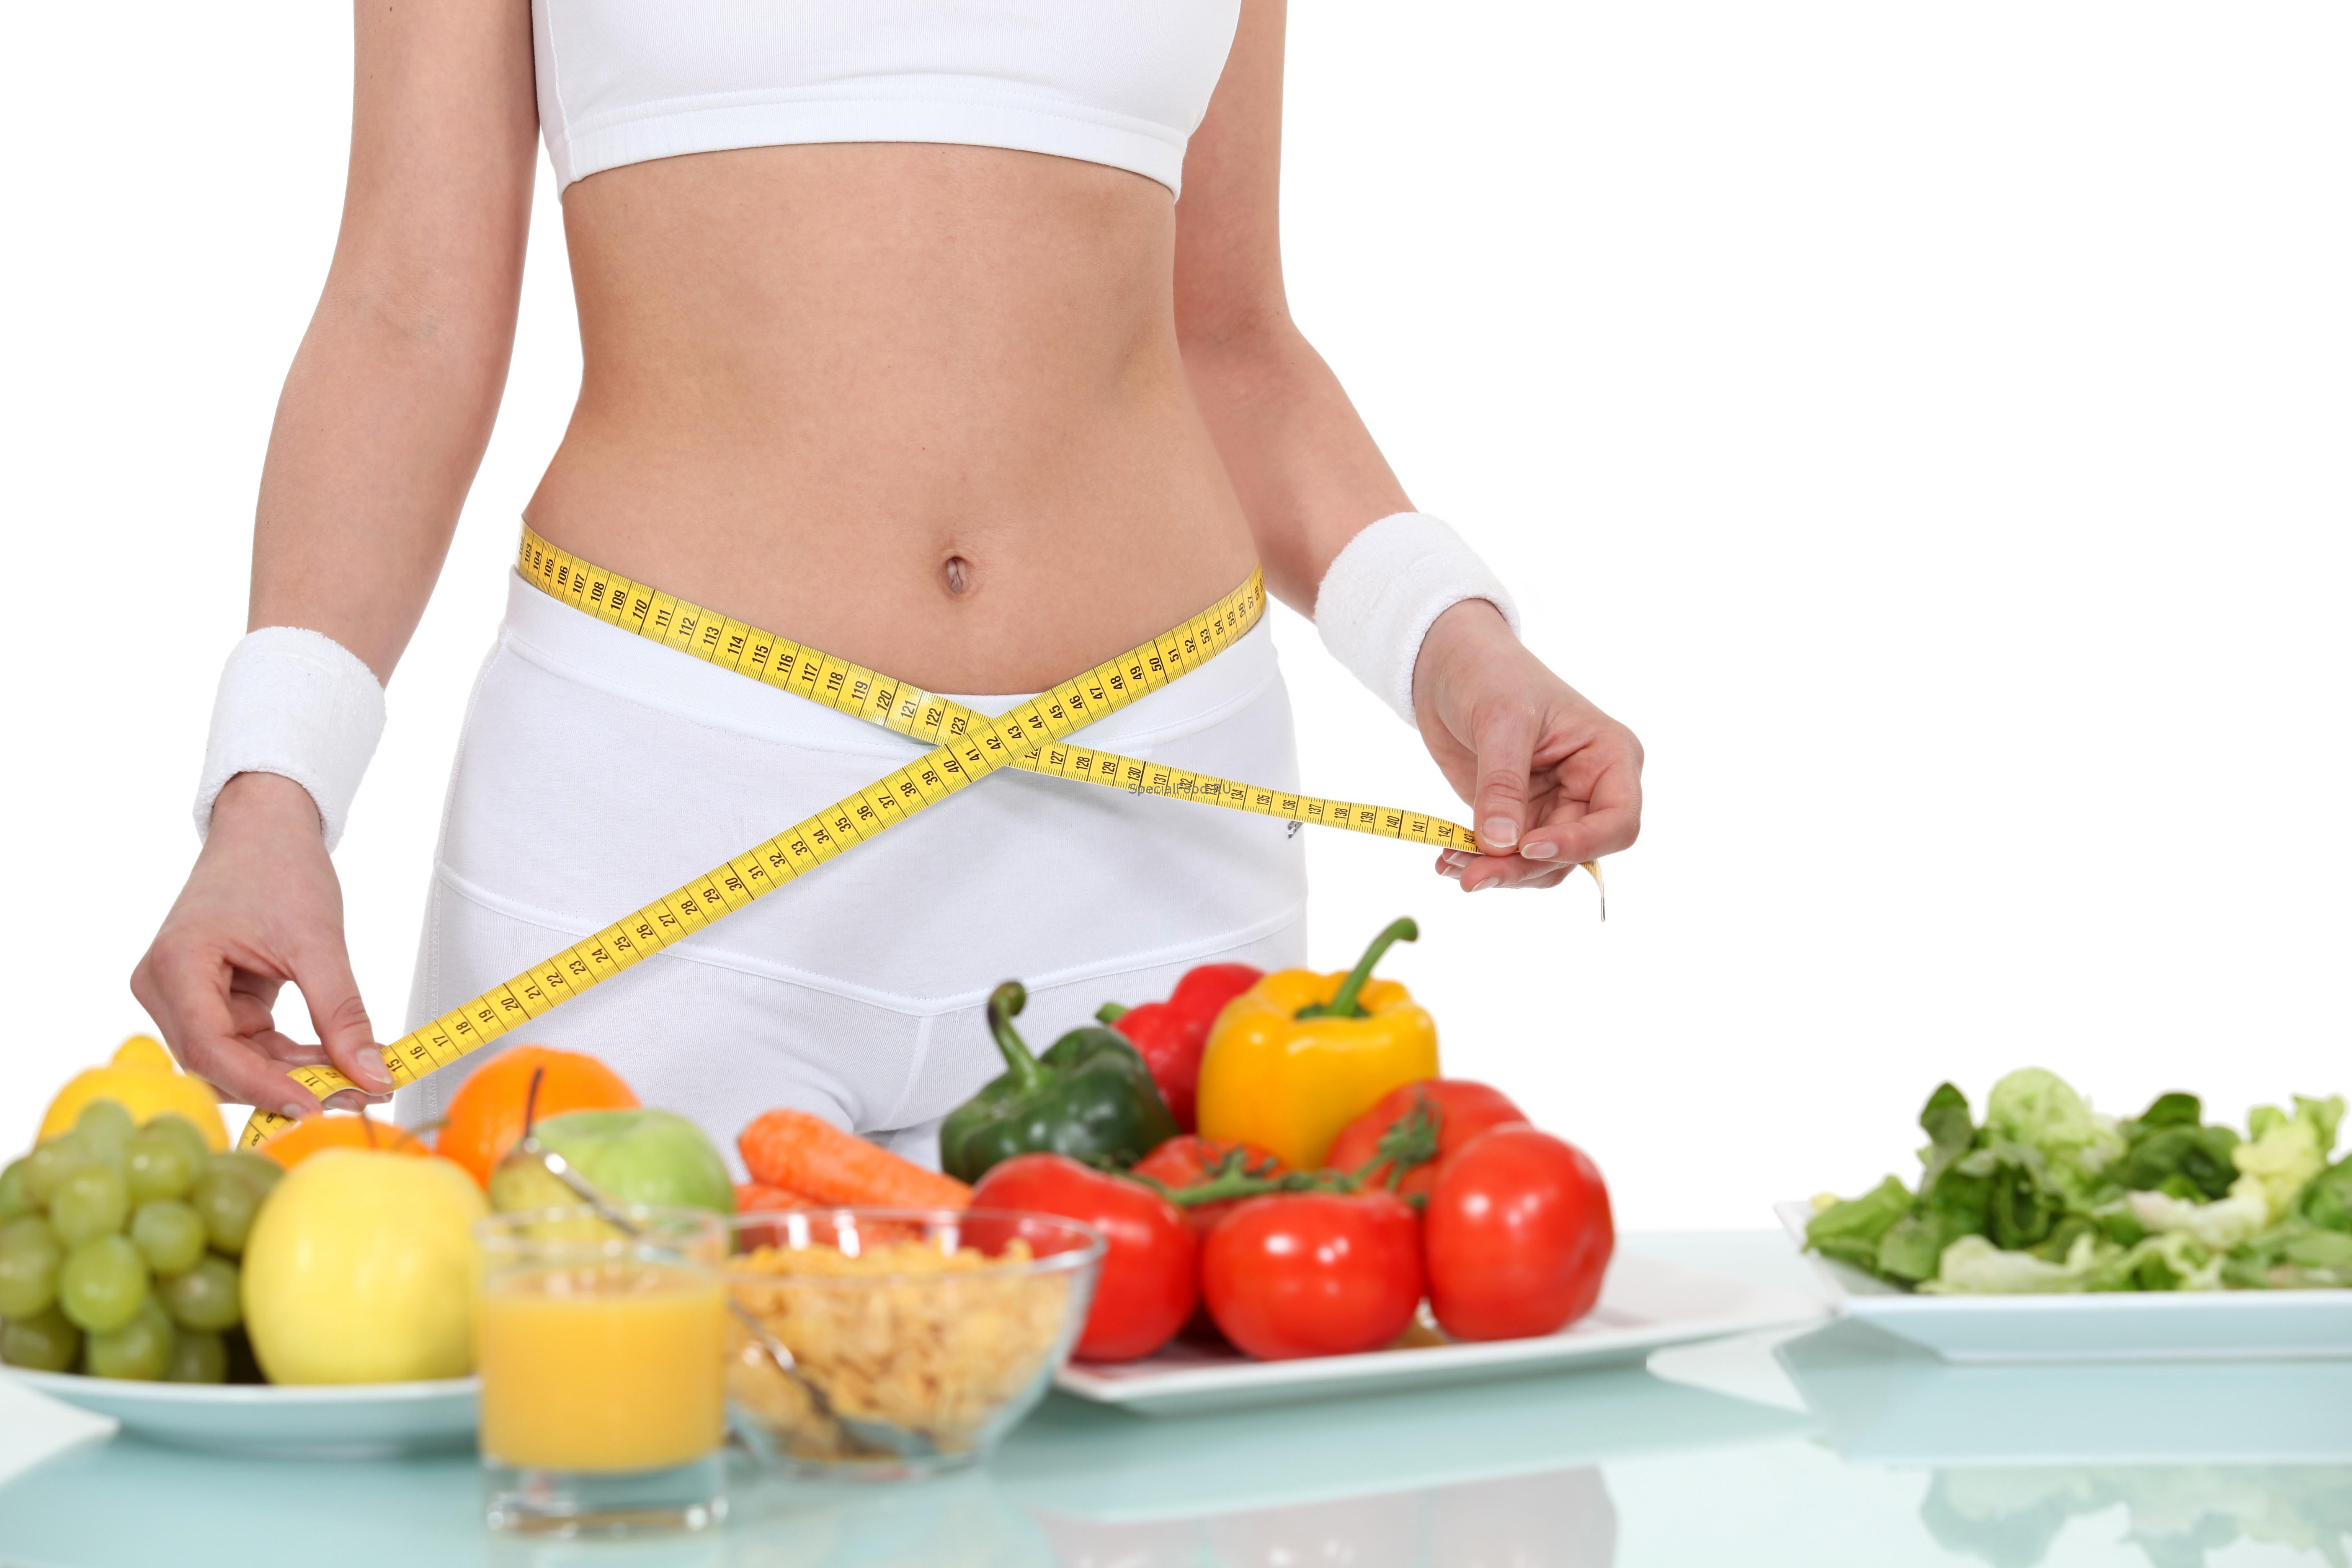 Веществ улучшения направлена обмена на диета